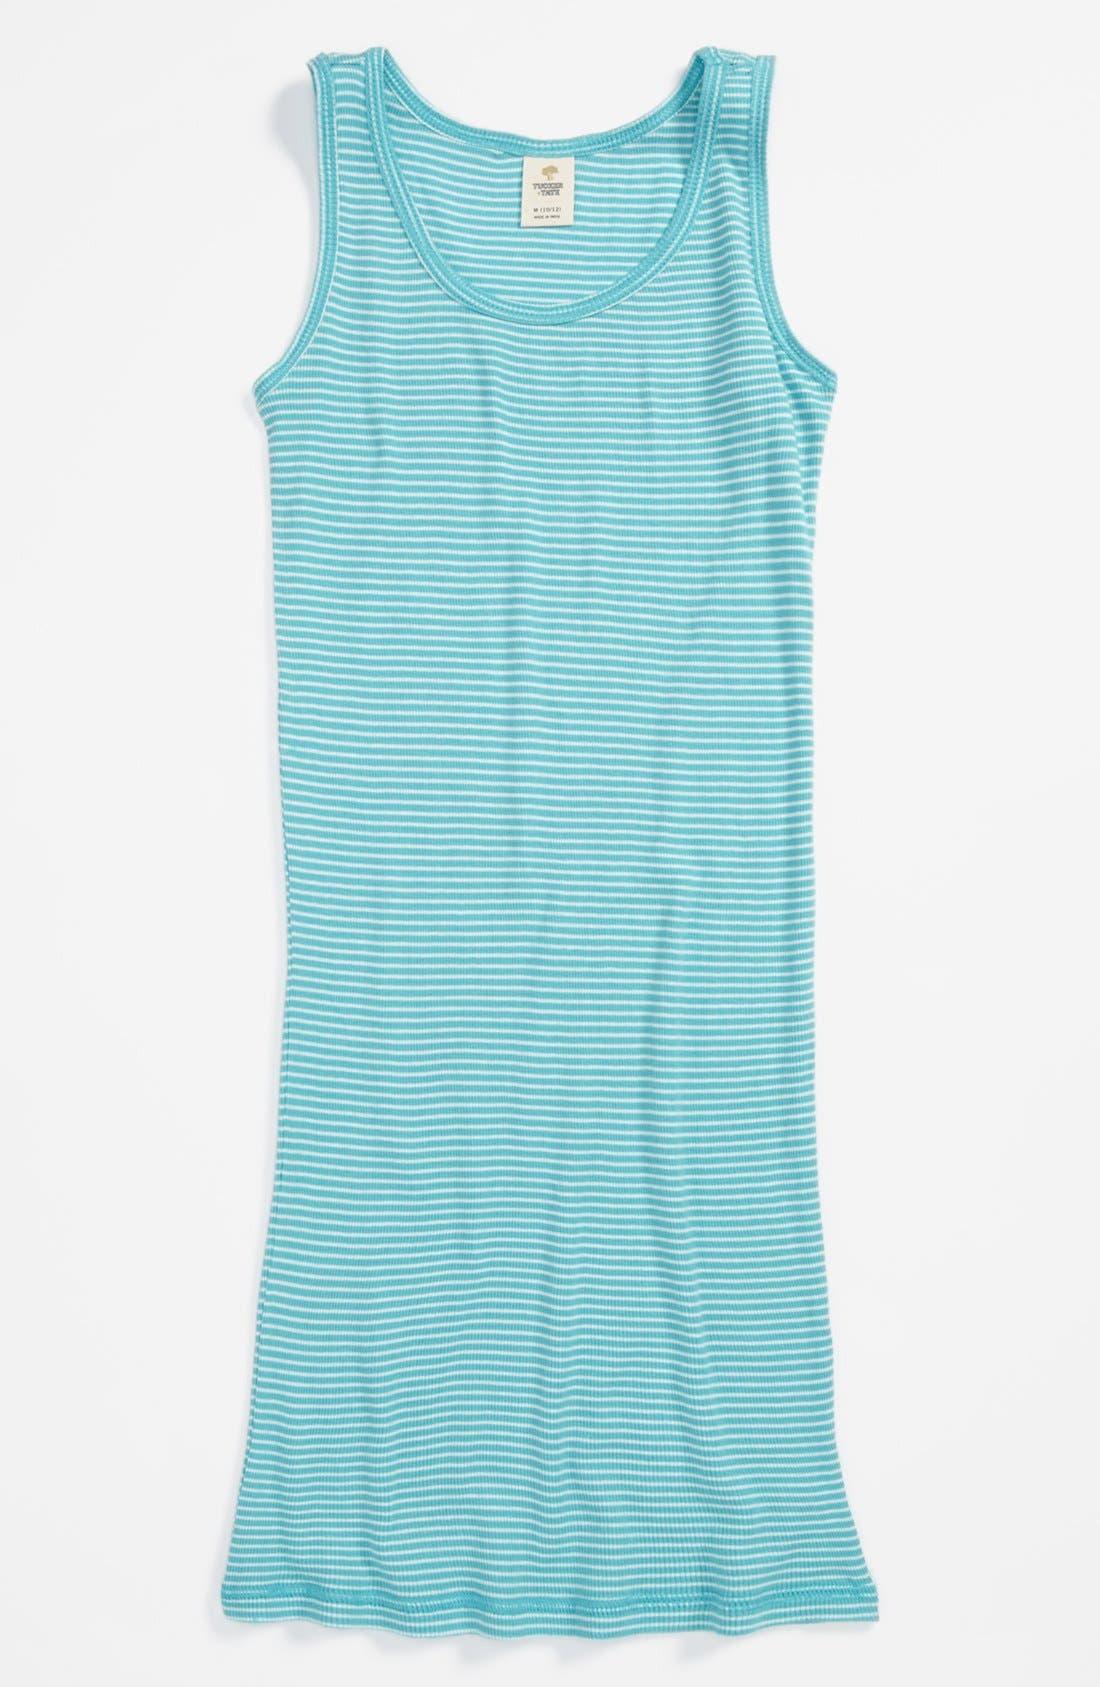 Alternate Image 1 Selected - Tucker + Tate 'Naomi' Knit Dress (Big Girls)